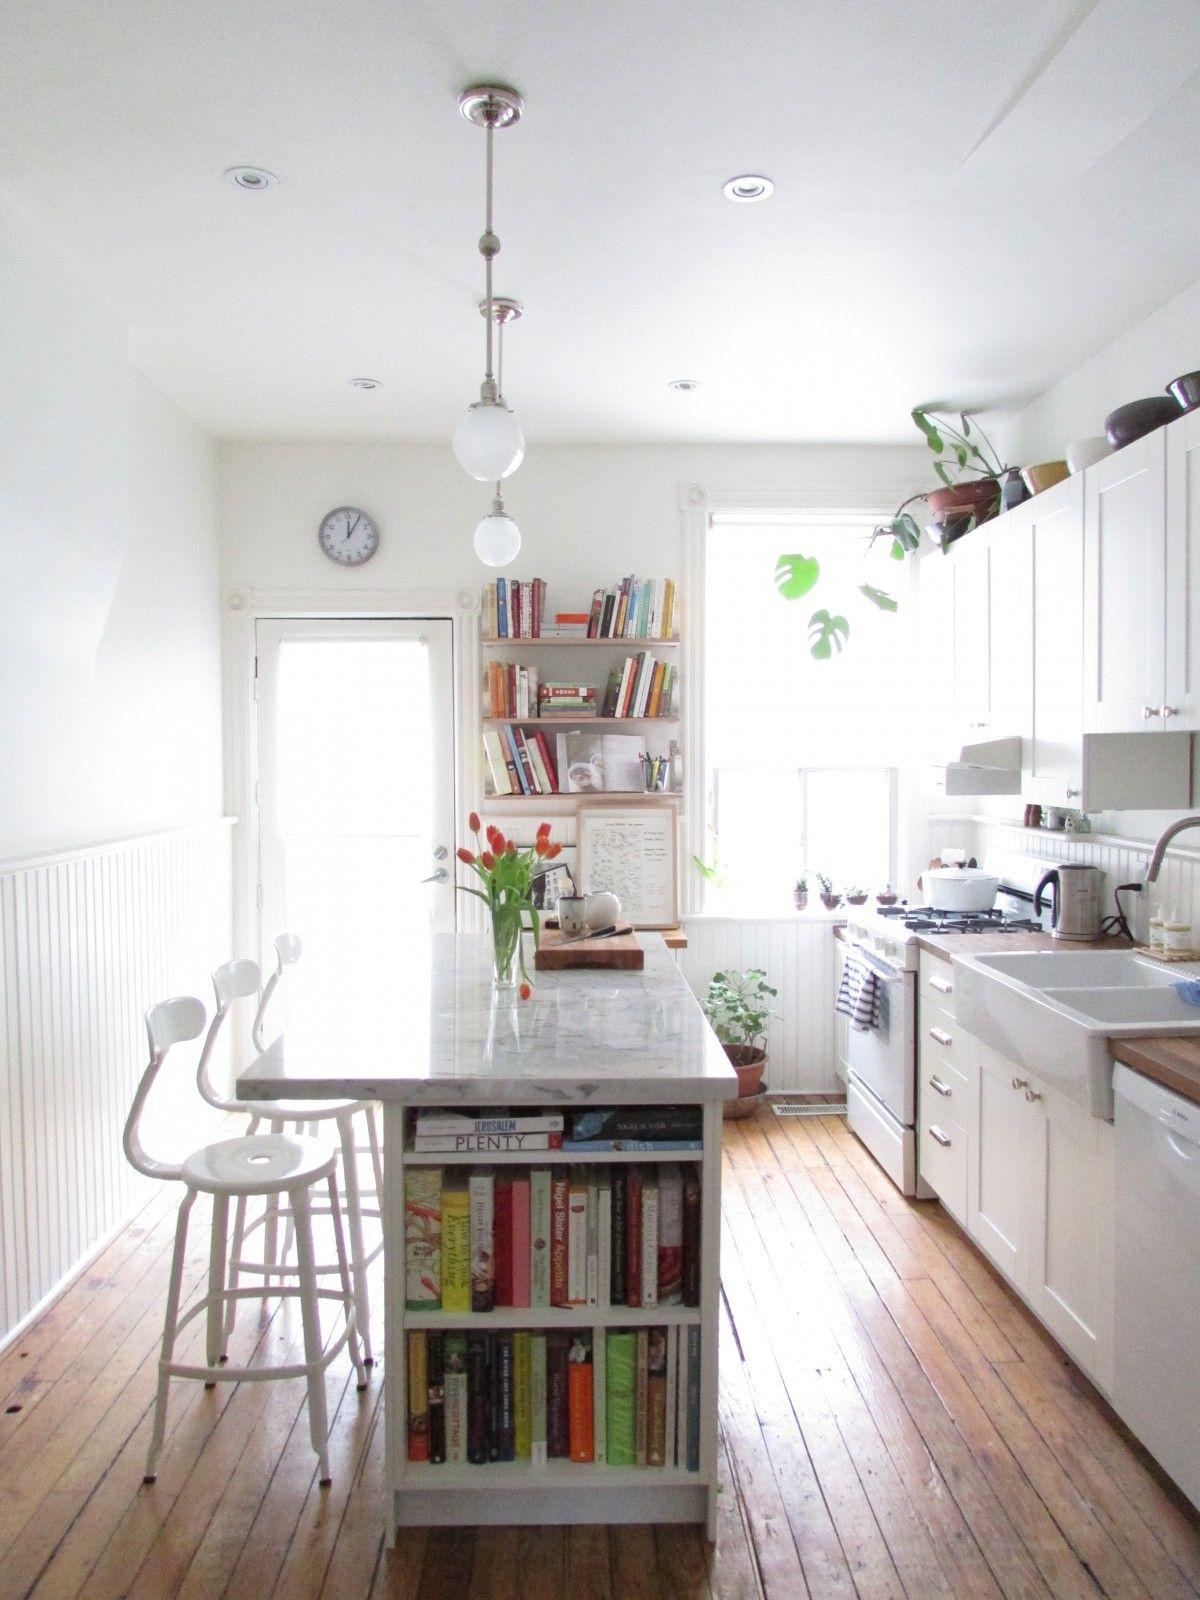 Via Room Reveal - Victorian kitchen by Jenn Hannotte